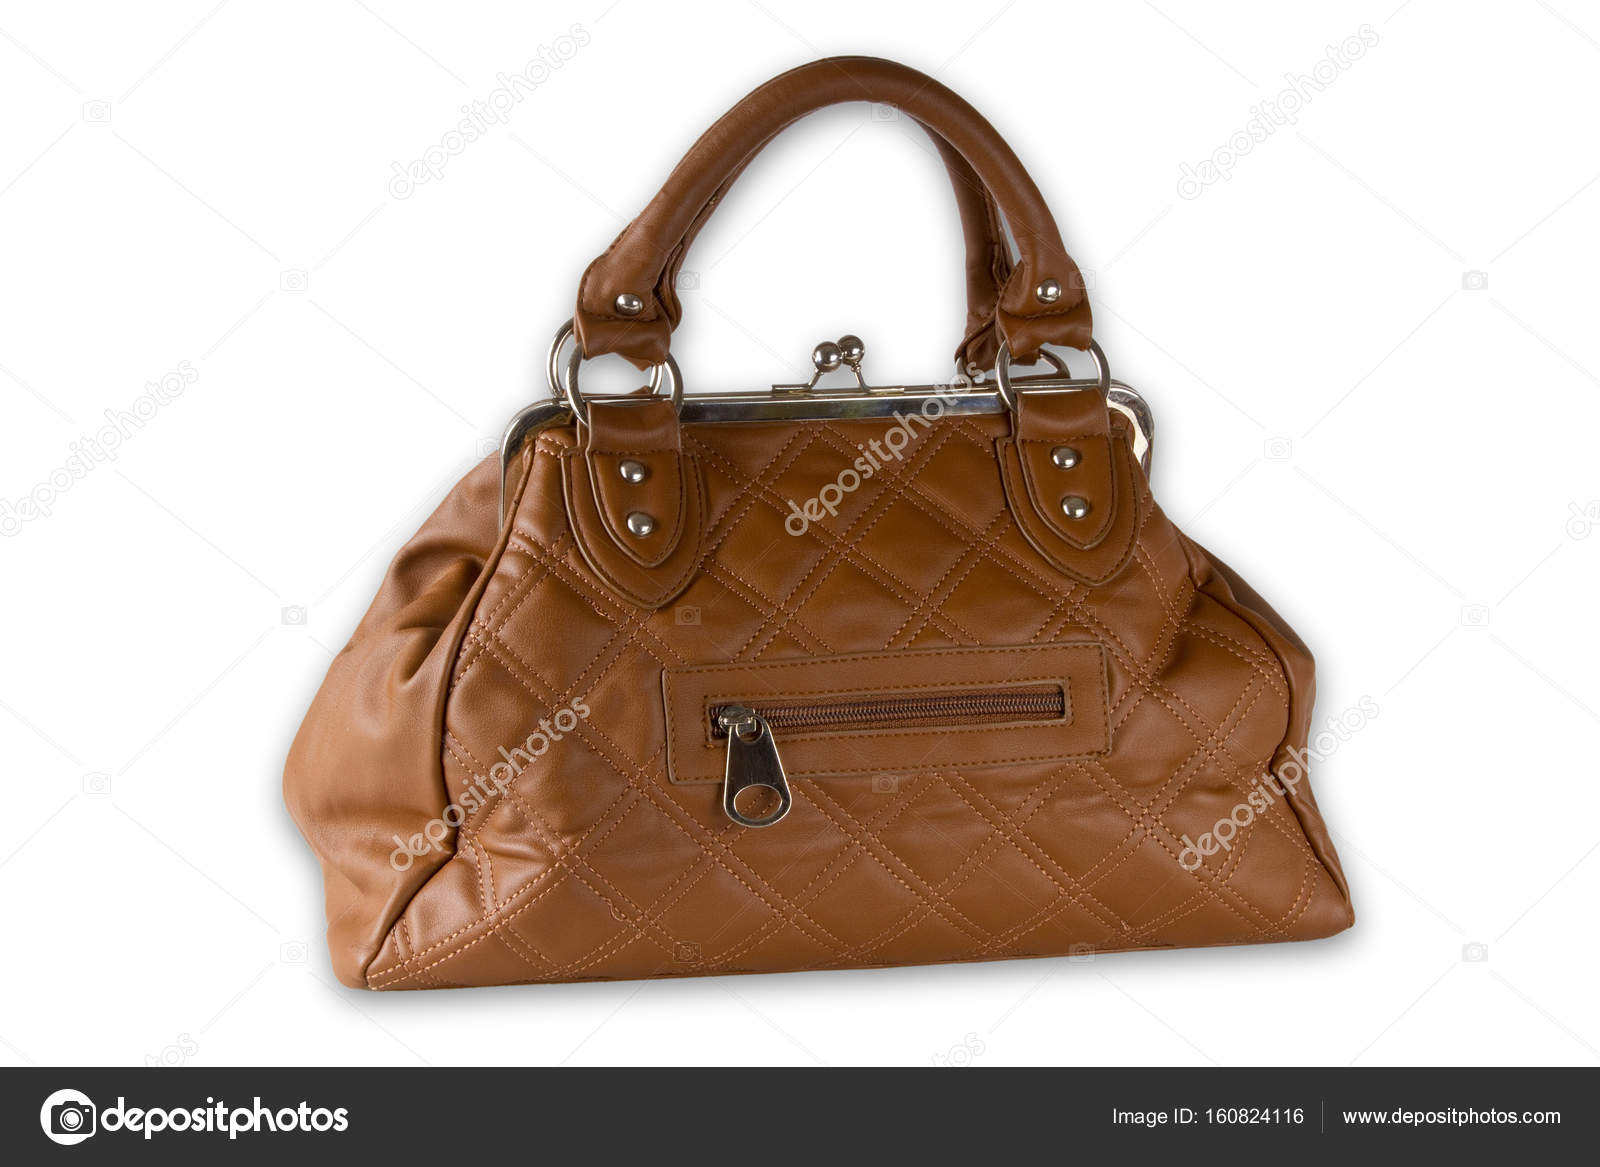 3e10e4257d Hnědá kabelka izolovaných na bílém pozadí — Fotografie od ...